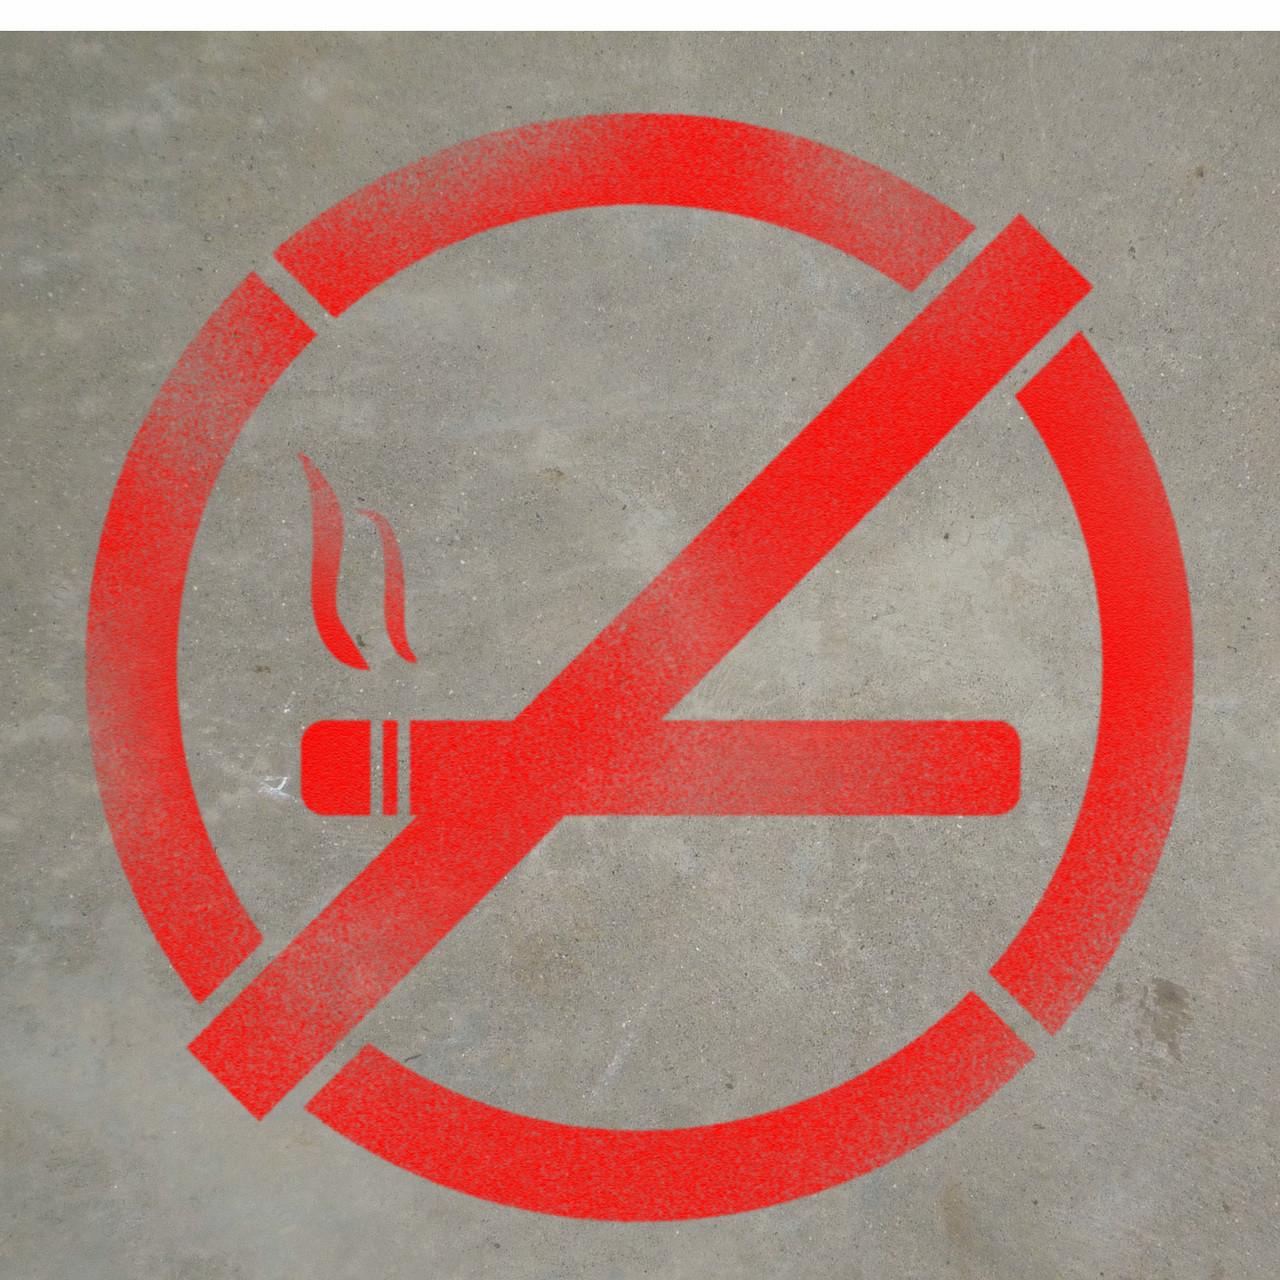 No smoking symbol stencil creative safety supply no smoking symbol stencil biocorpaavc Image collections